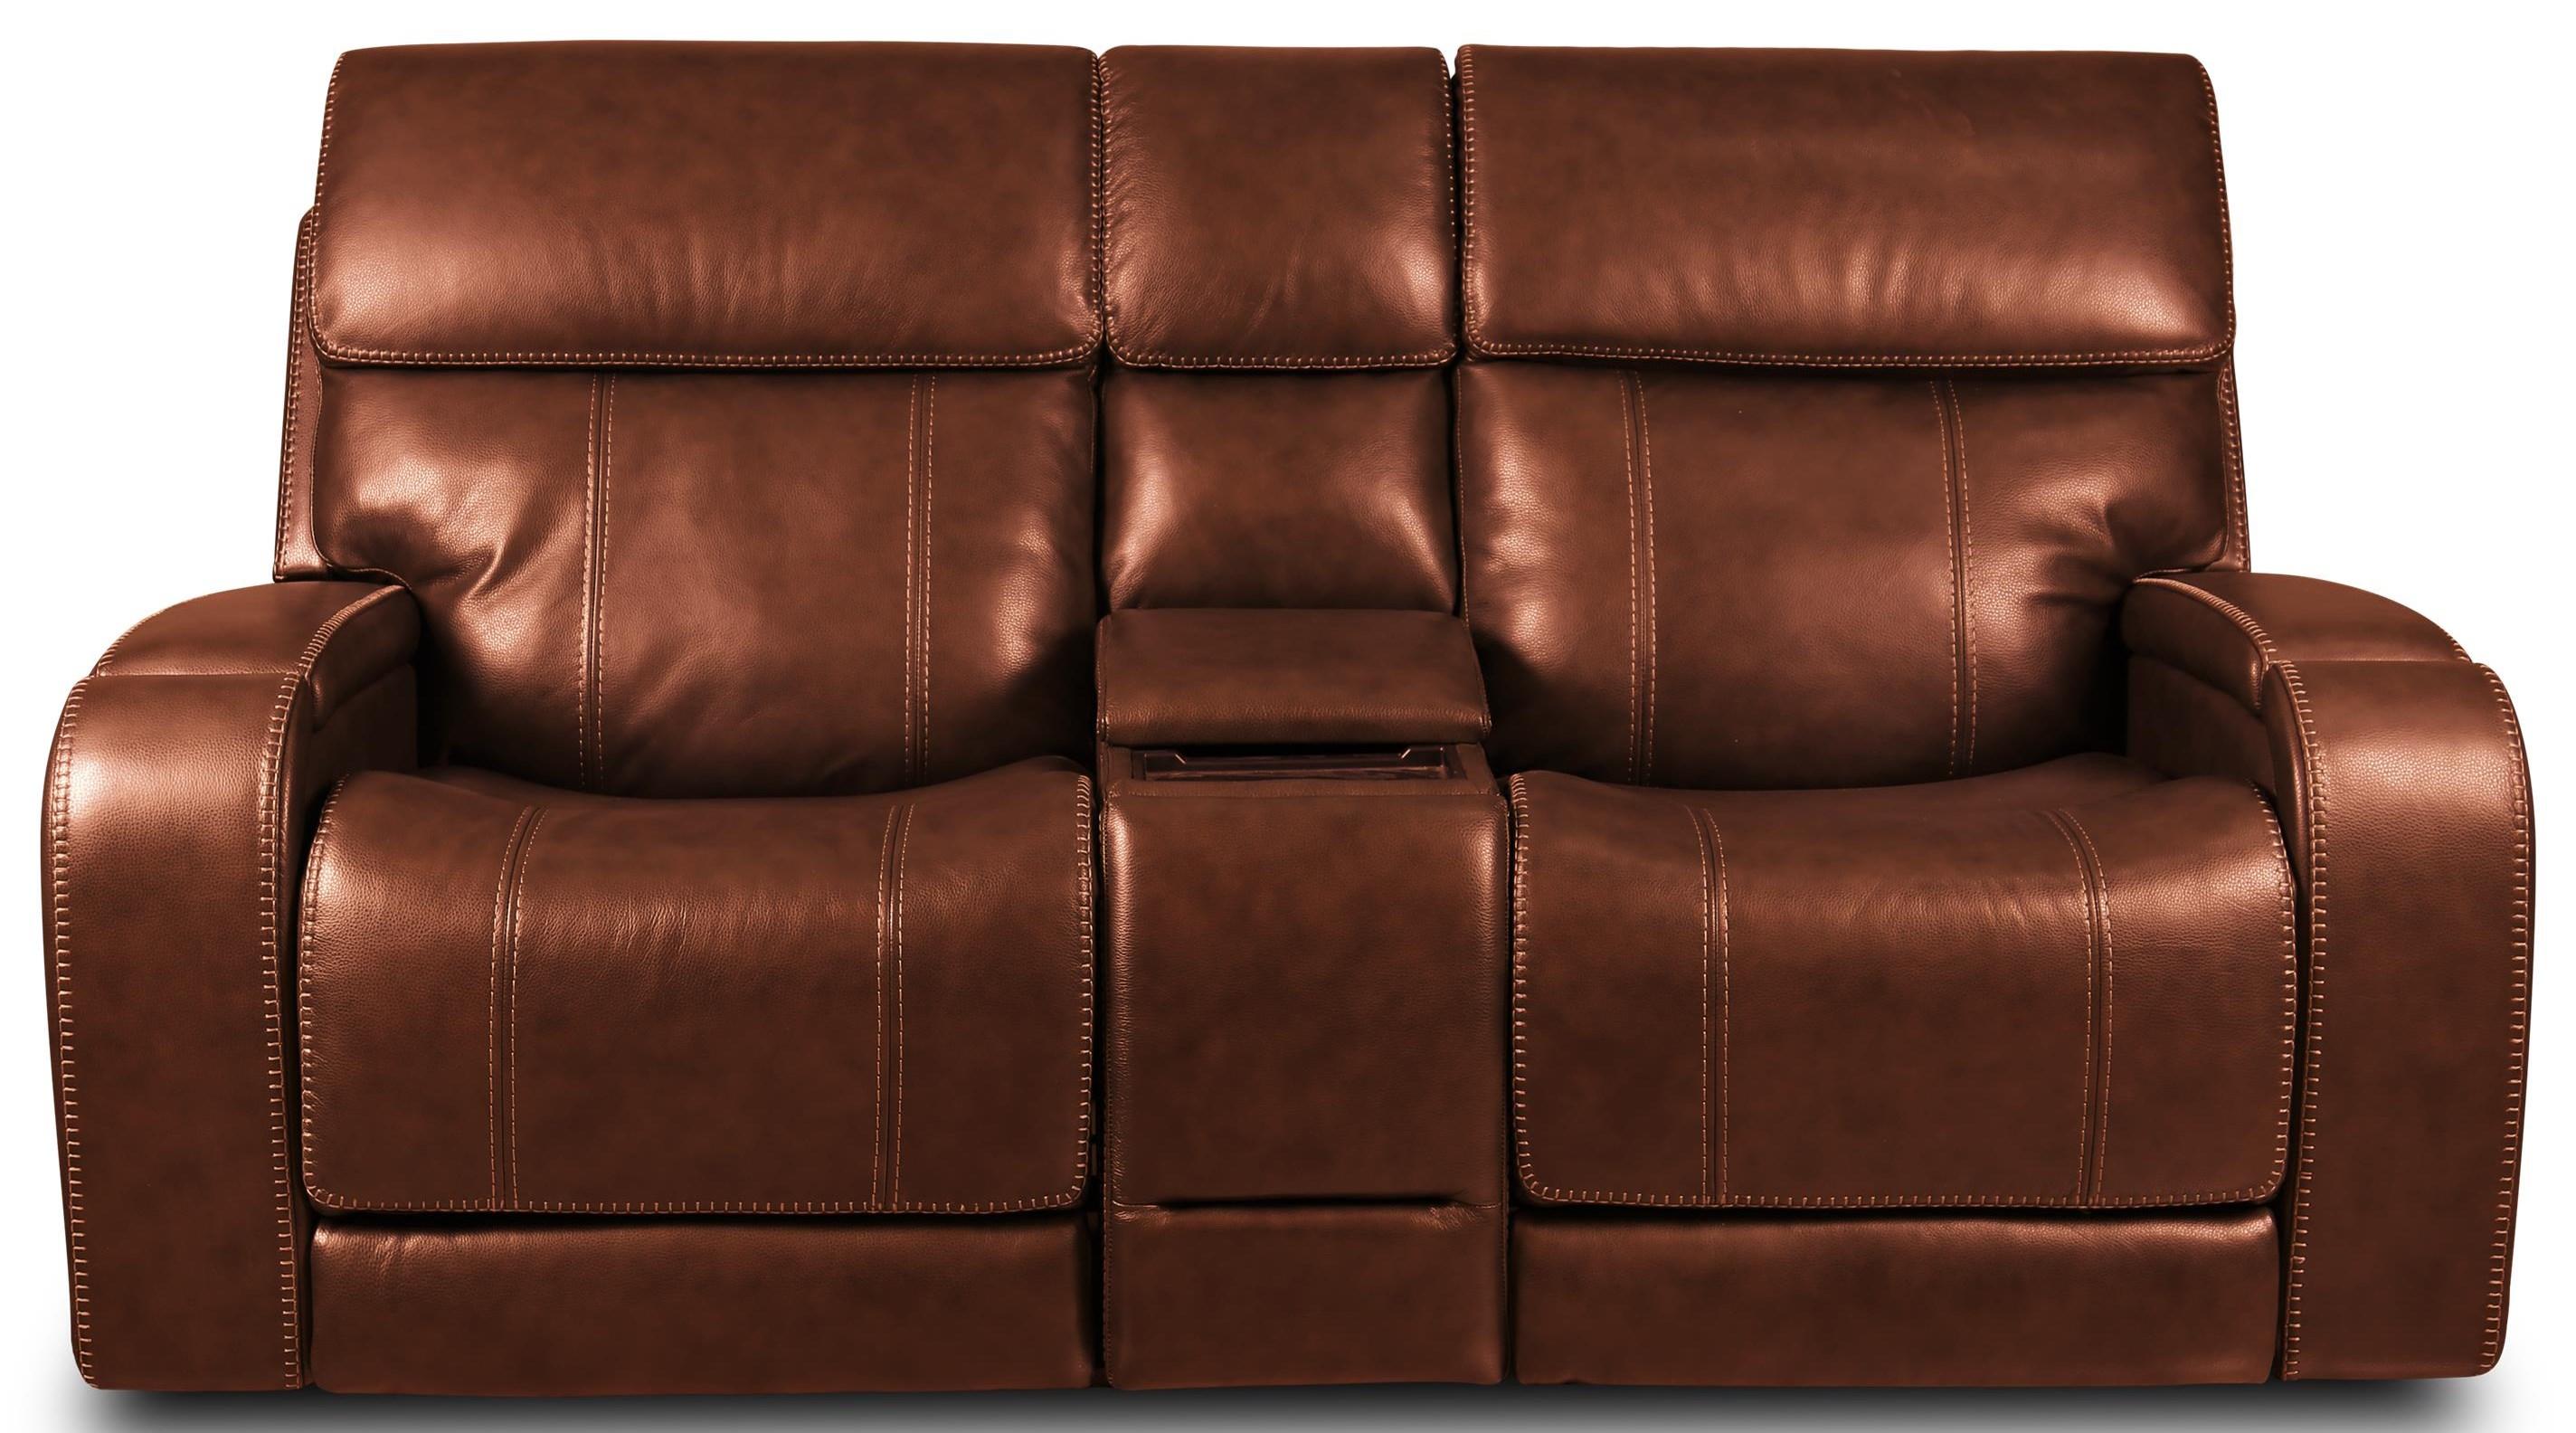 462 Sofa Triple Power Leather Reclining Loveseat by Moto Motion at Furniture Fair - North Carolina